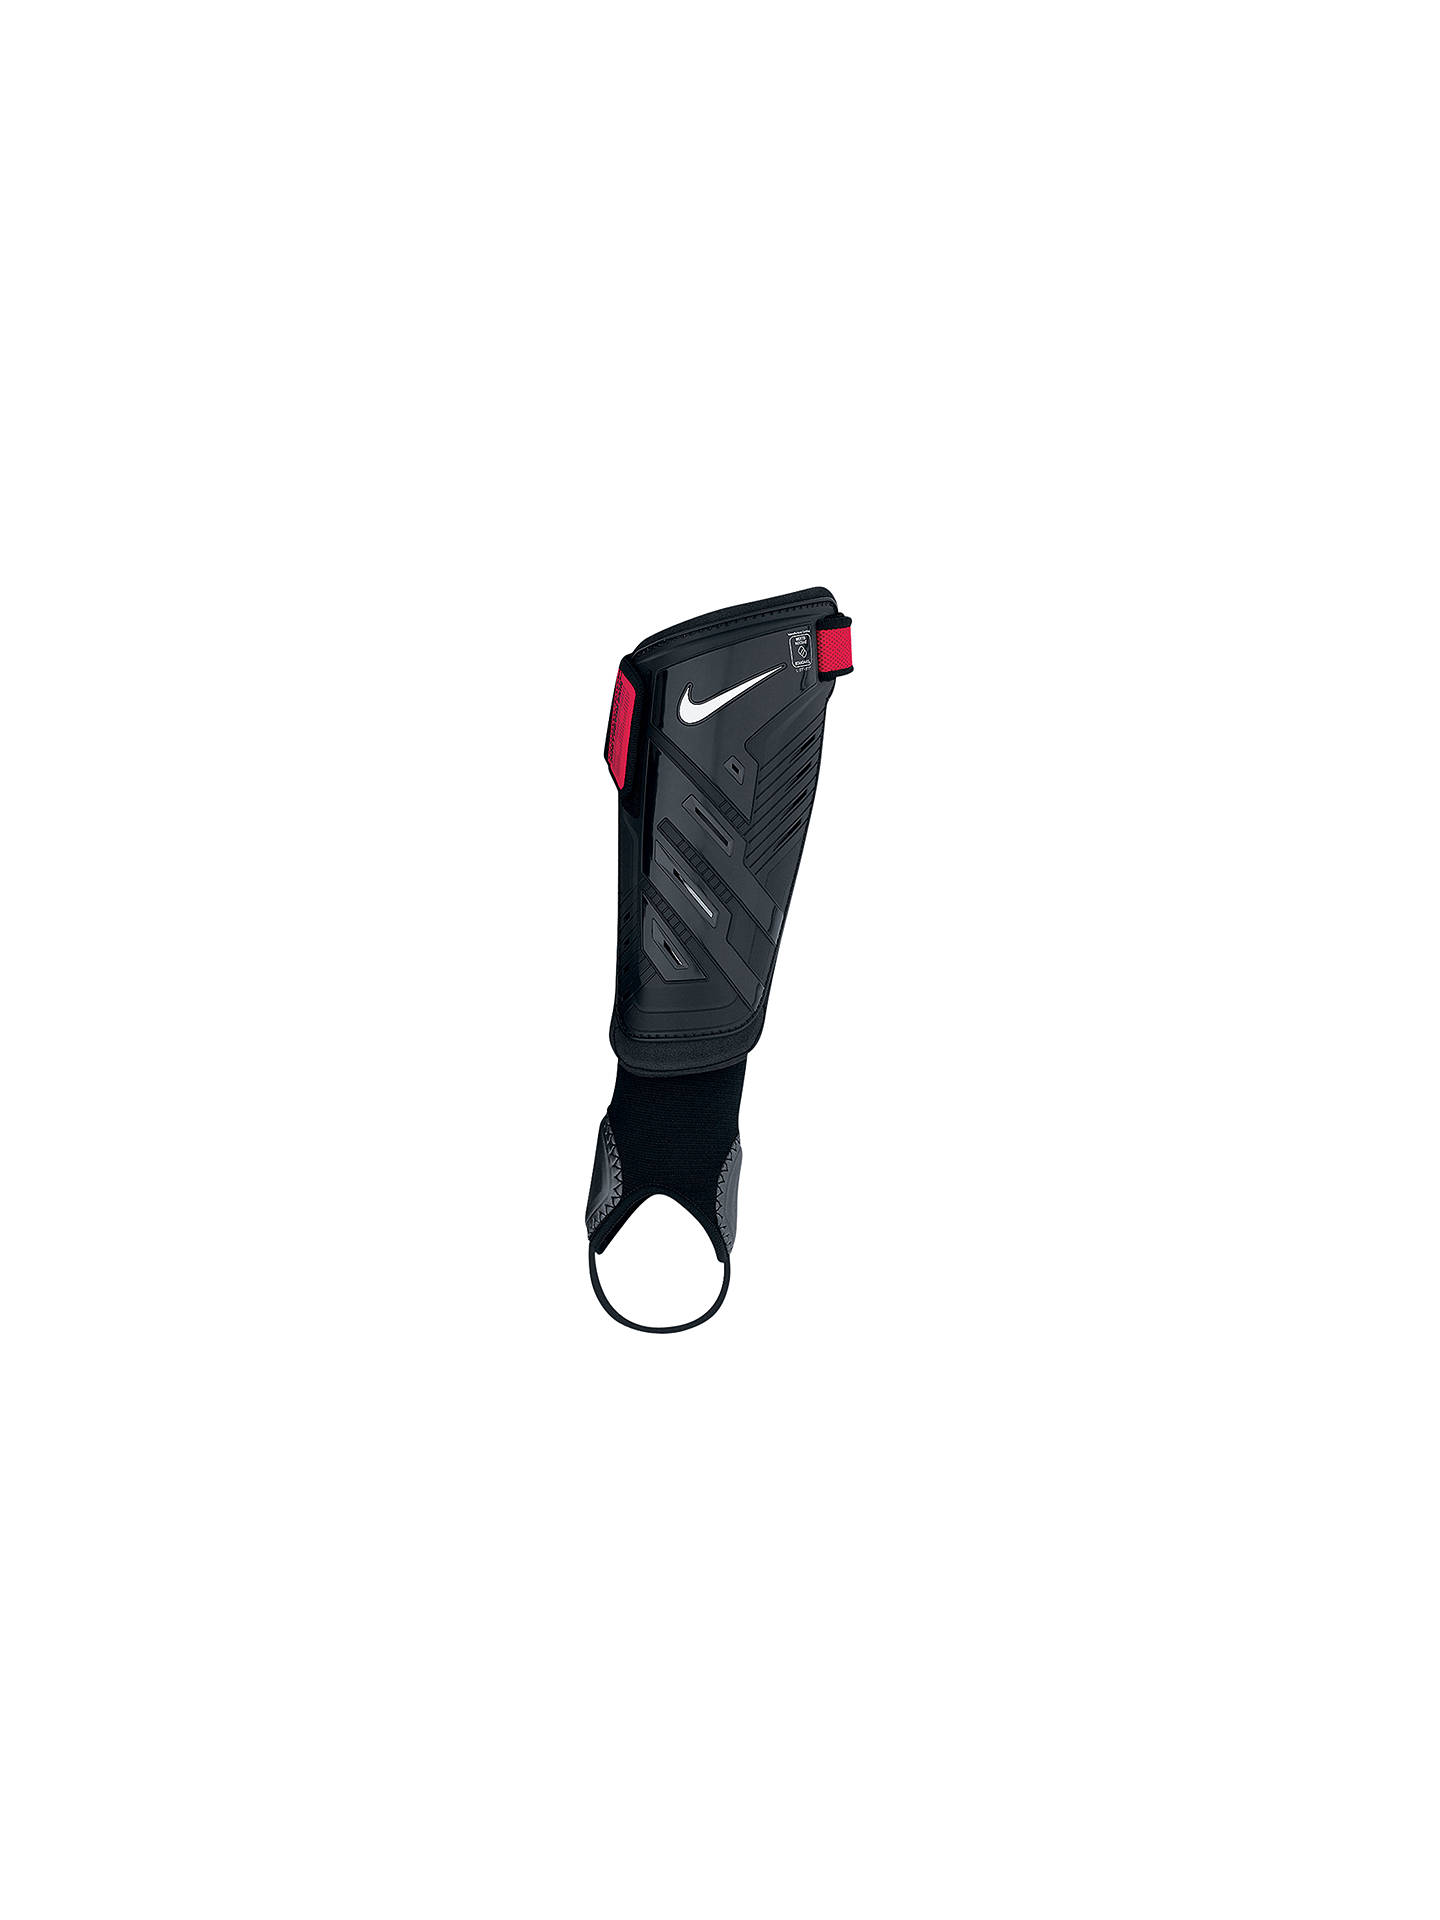 Acechar Divertidísimo tengo sueño  Nike Protegga Shield Shin Pads, Black at John Lewis & Partners